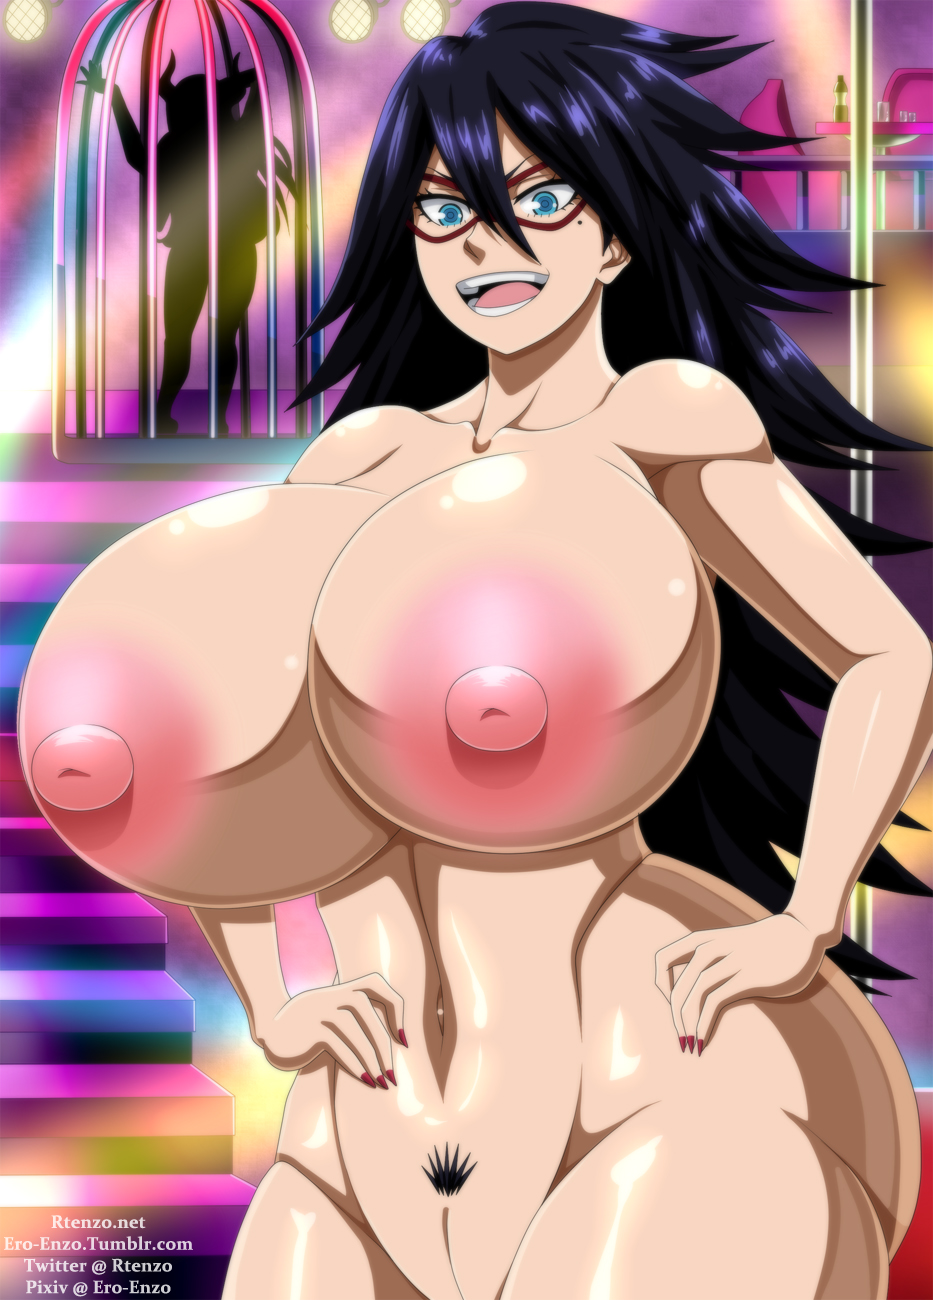 female heroes hero academia my Etoge no yome wa onnanoko ja nai to omotta?